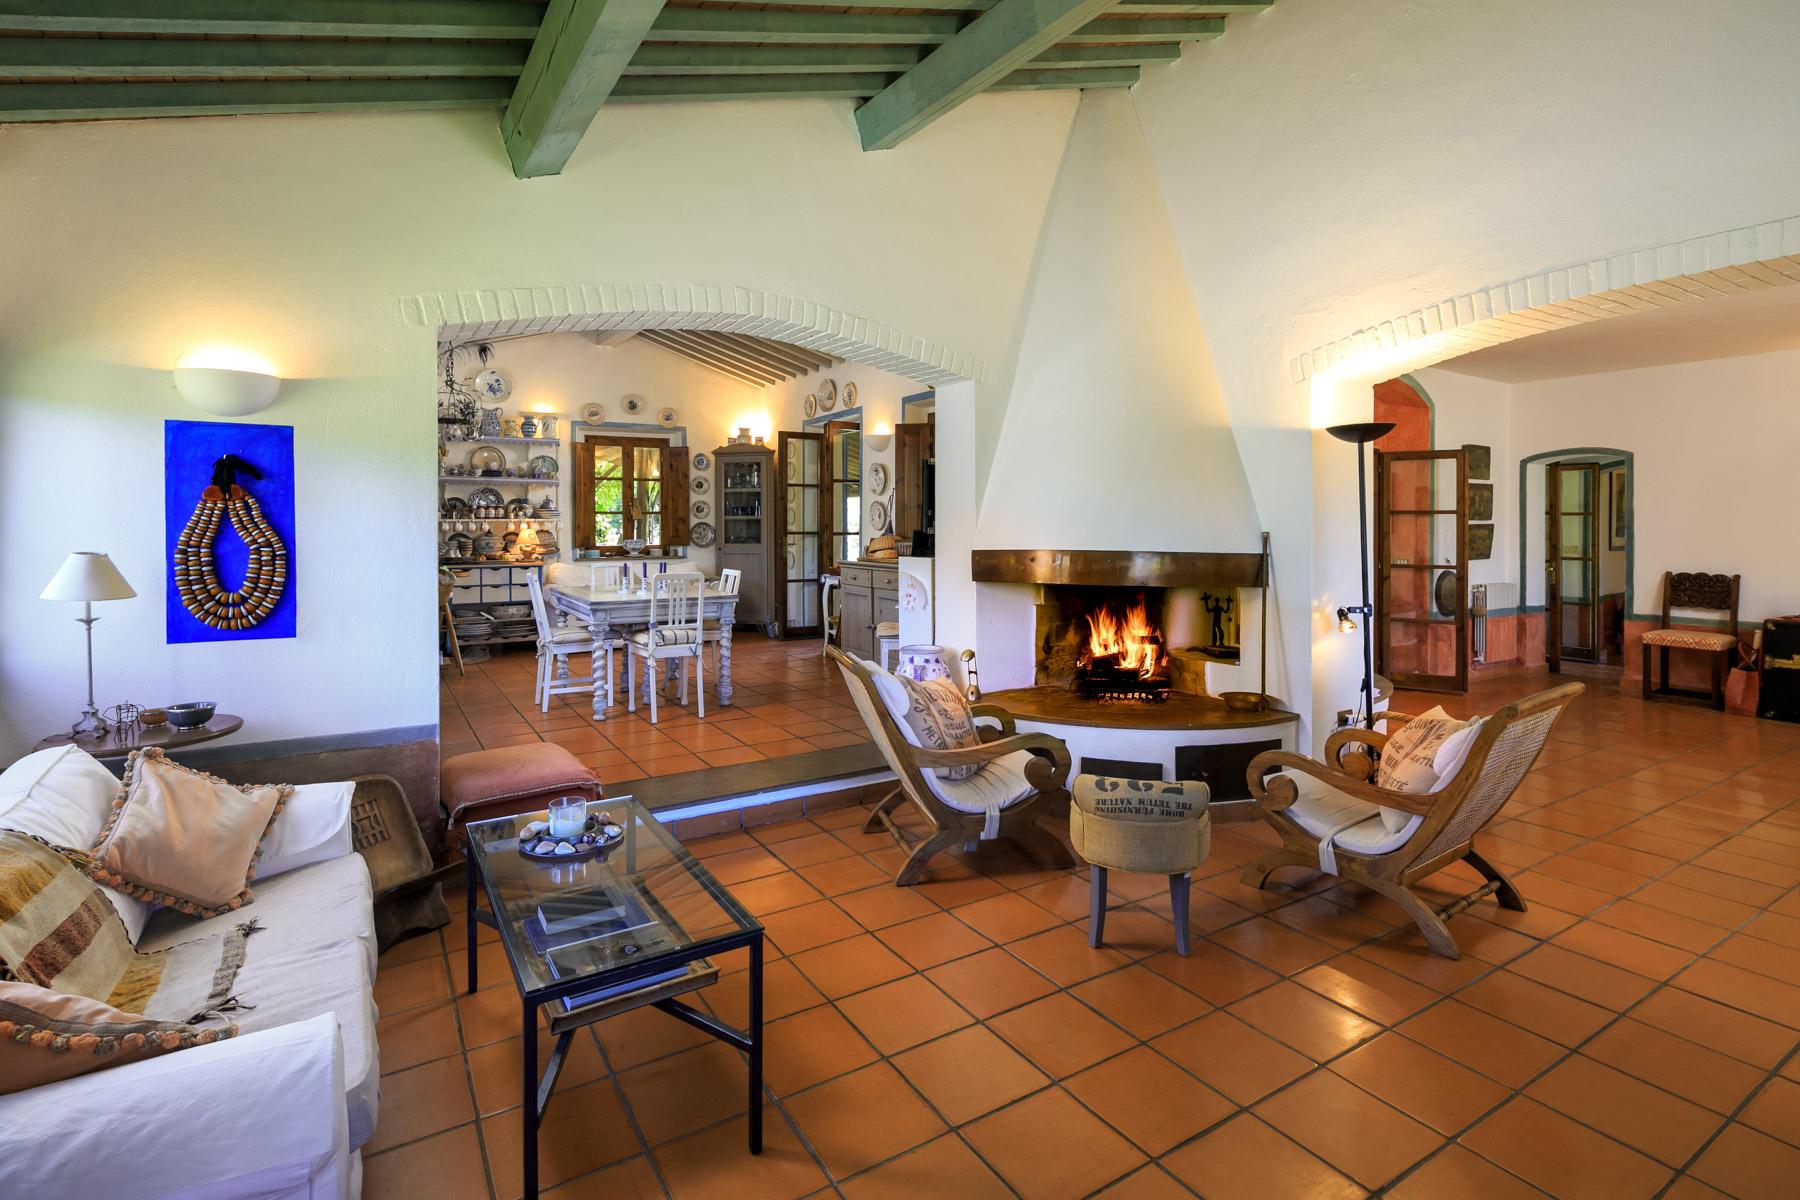 Villa in Vendita a Santa Luce: 5 locali, 270 mq - Foto 13